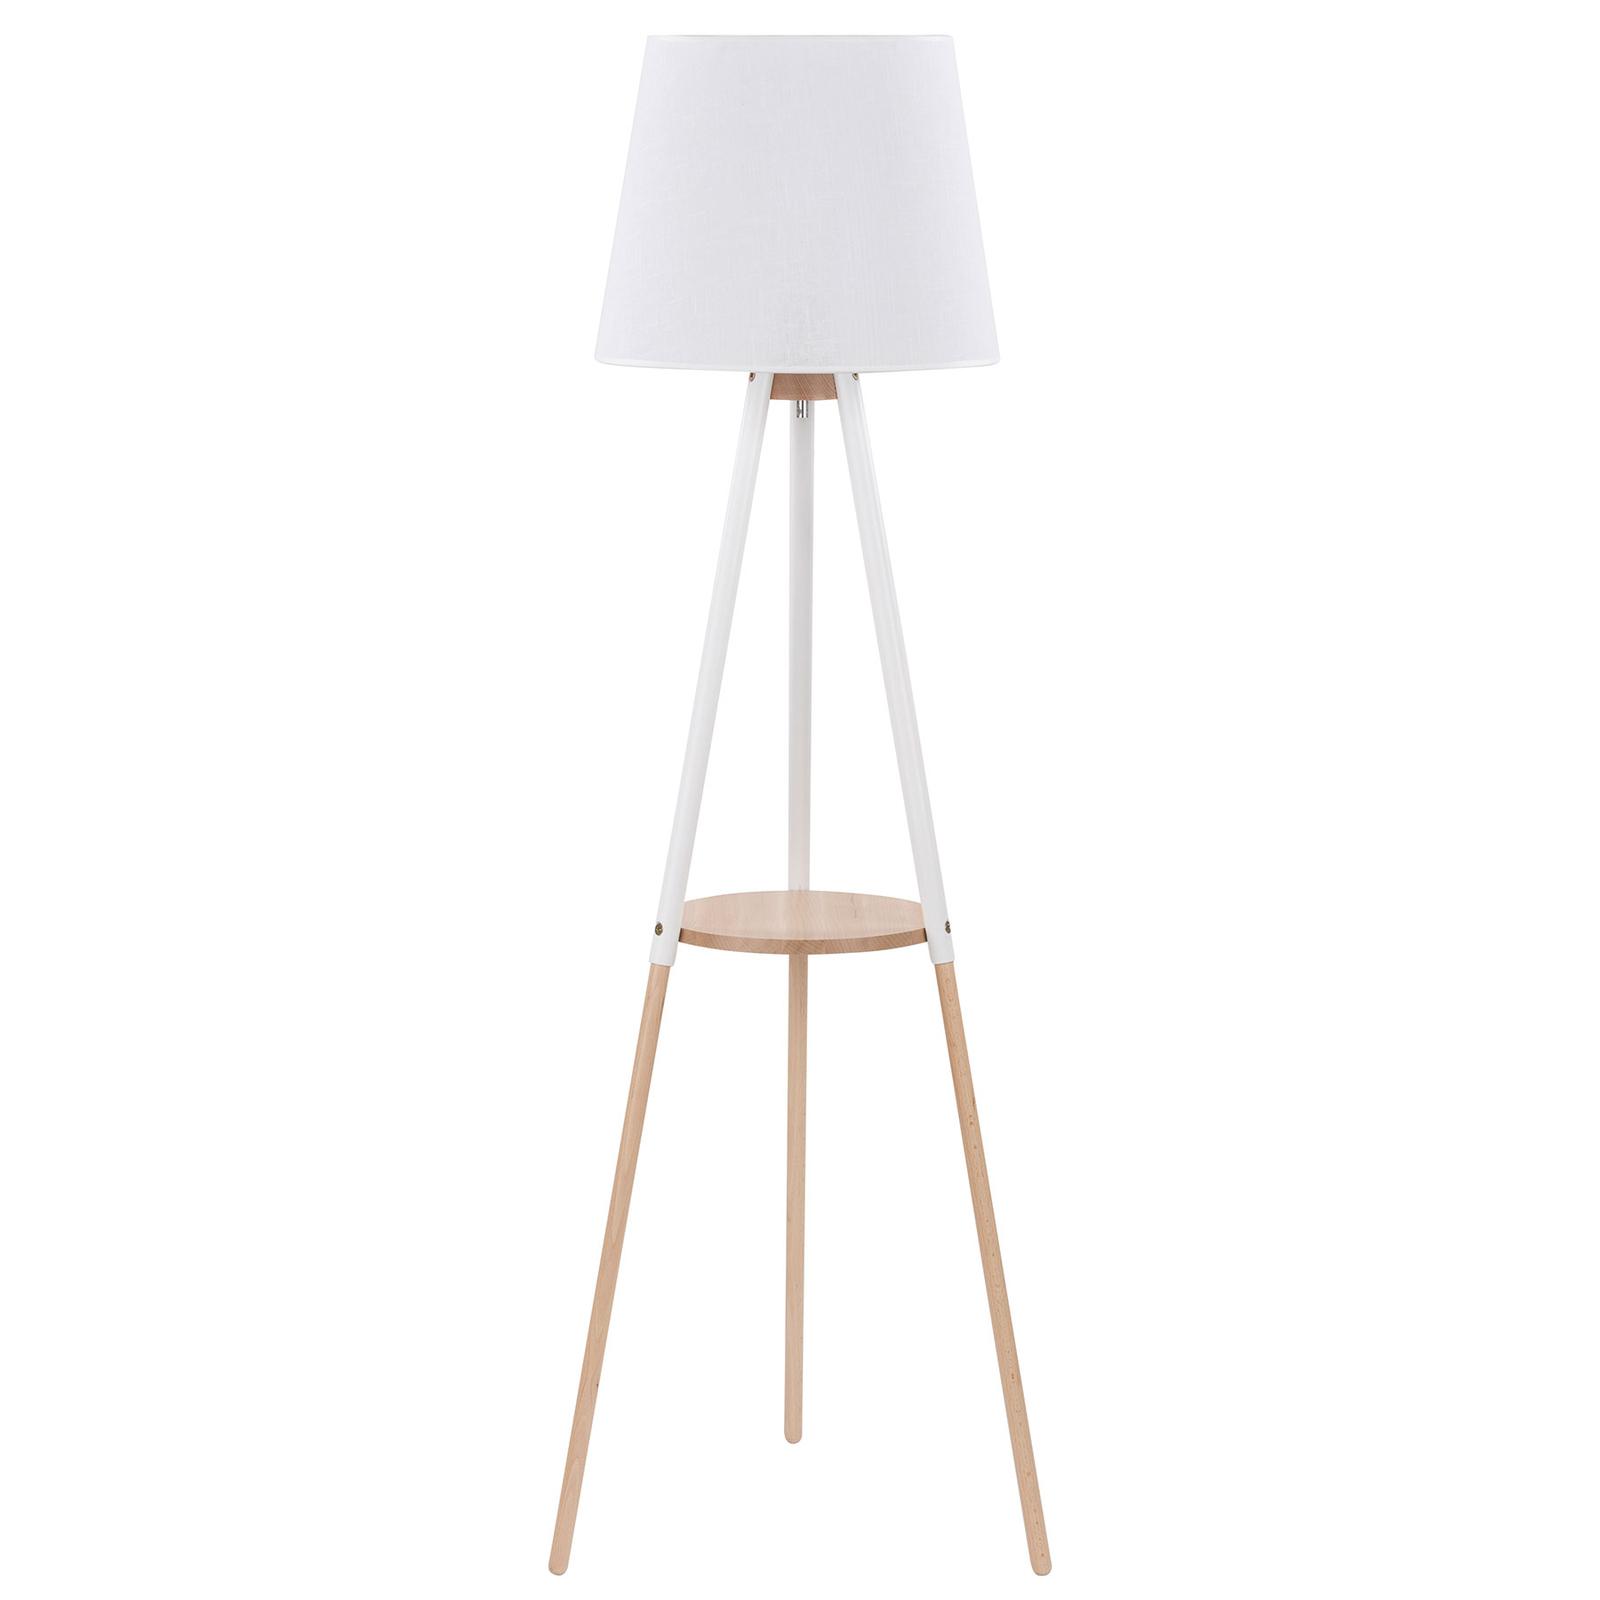 Vloerlamp Vaio driebeen-houten frame, witte kap